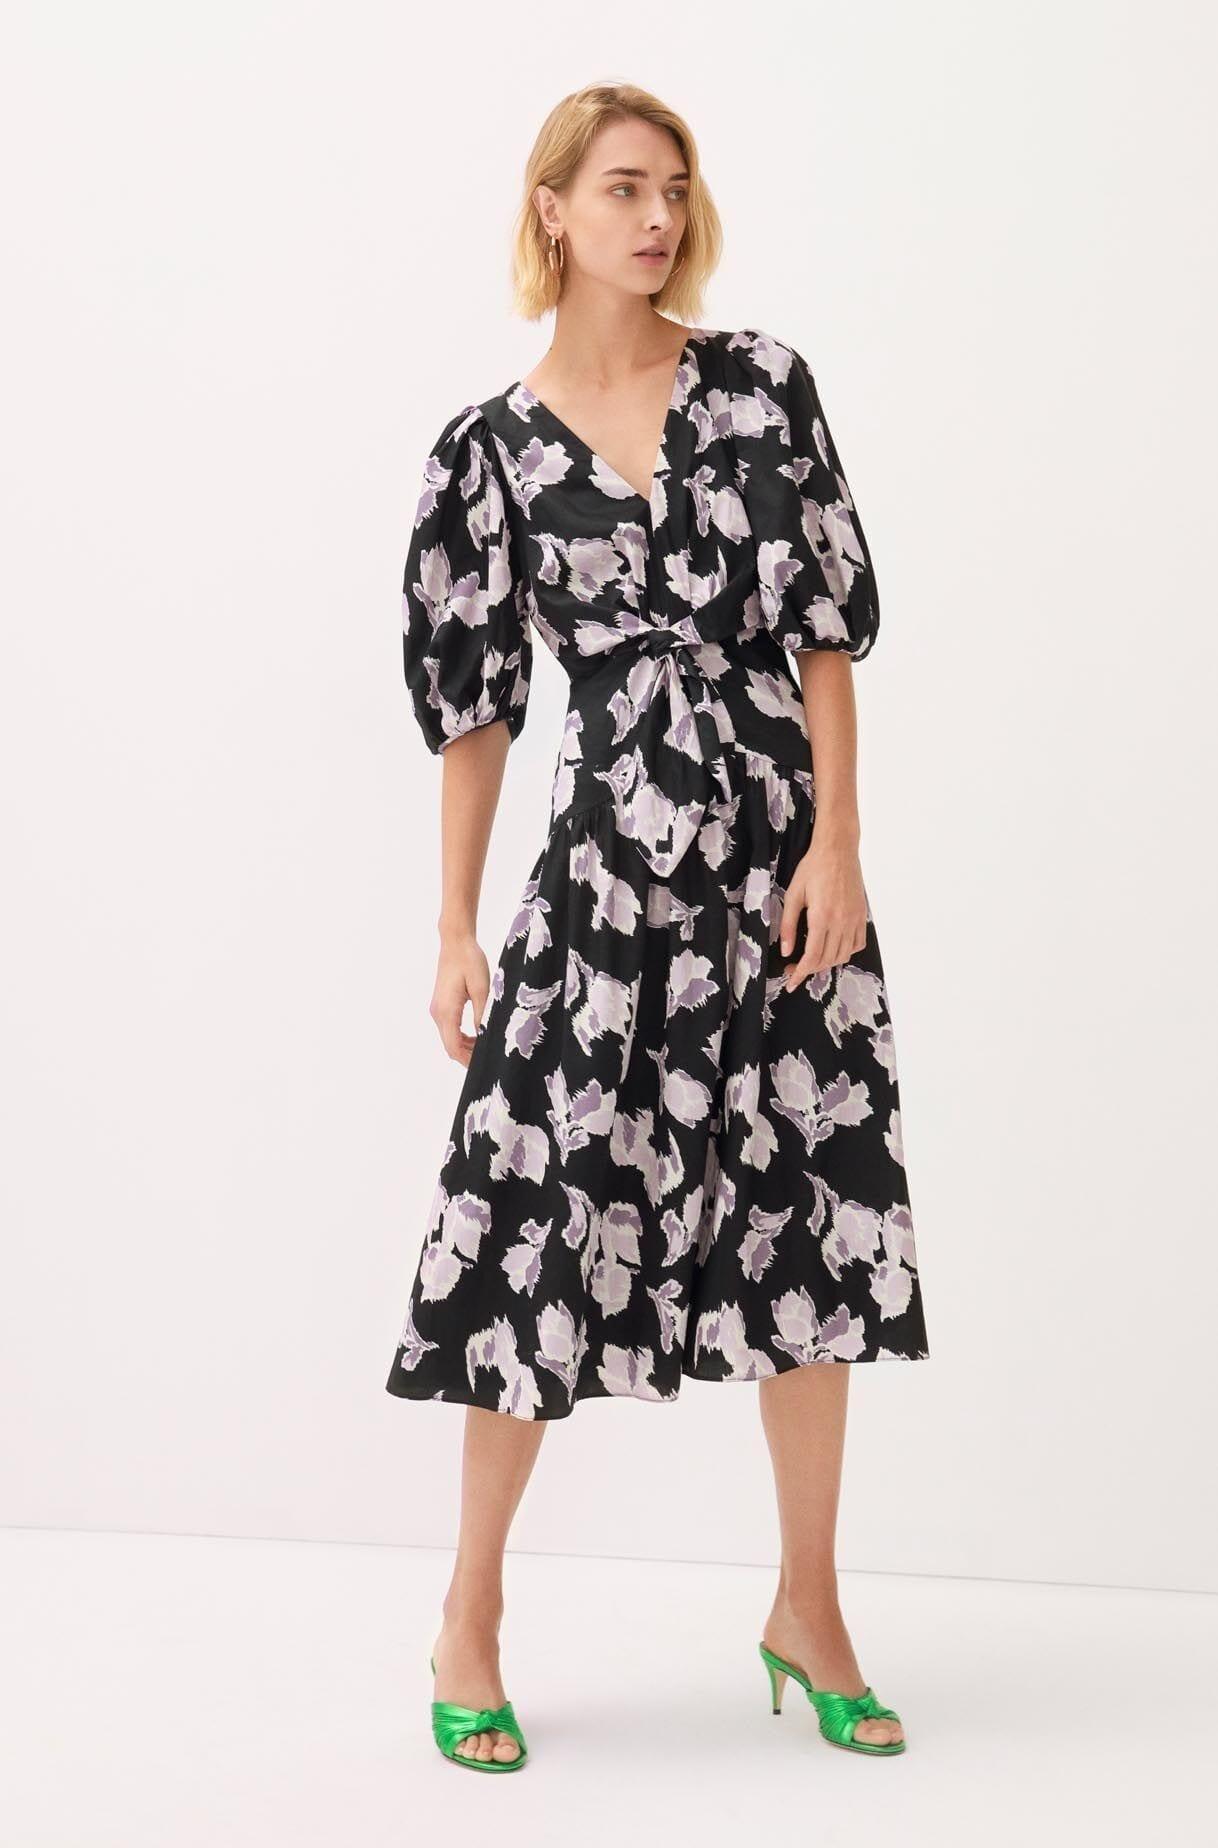 REBECKA TAYLOR Ikat Blossom Cotton Dress